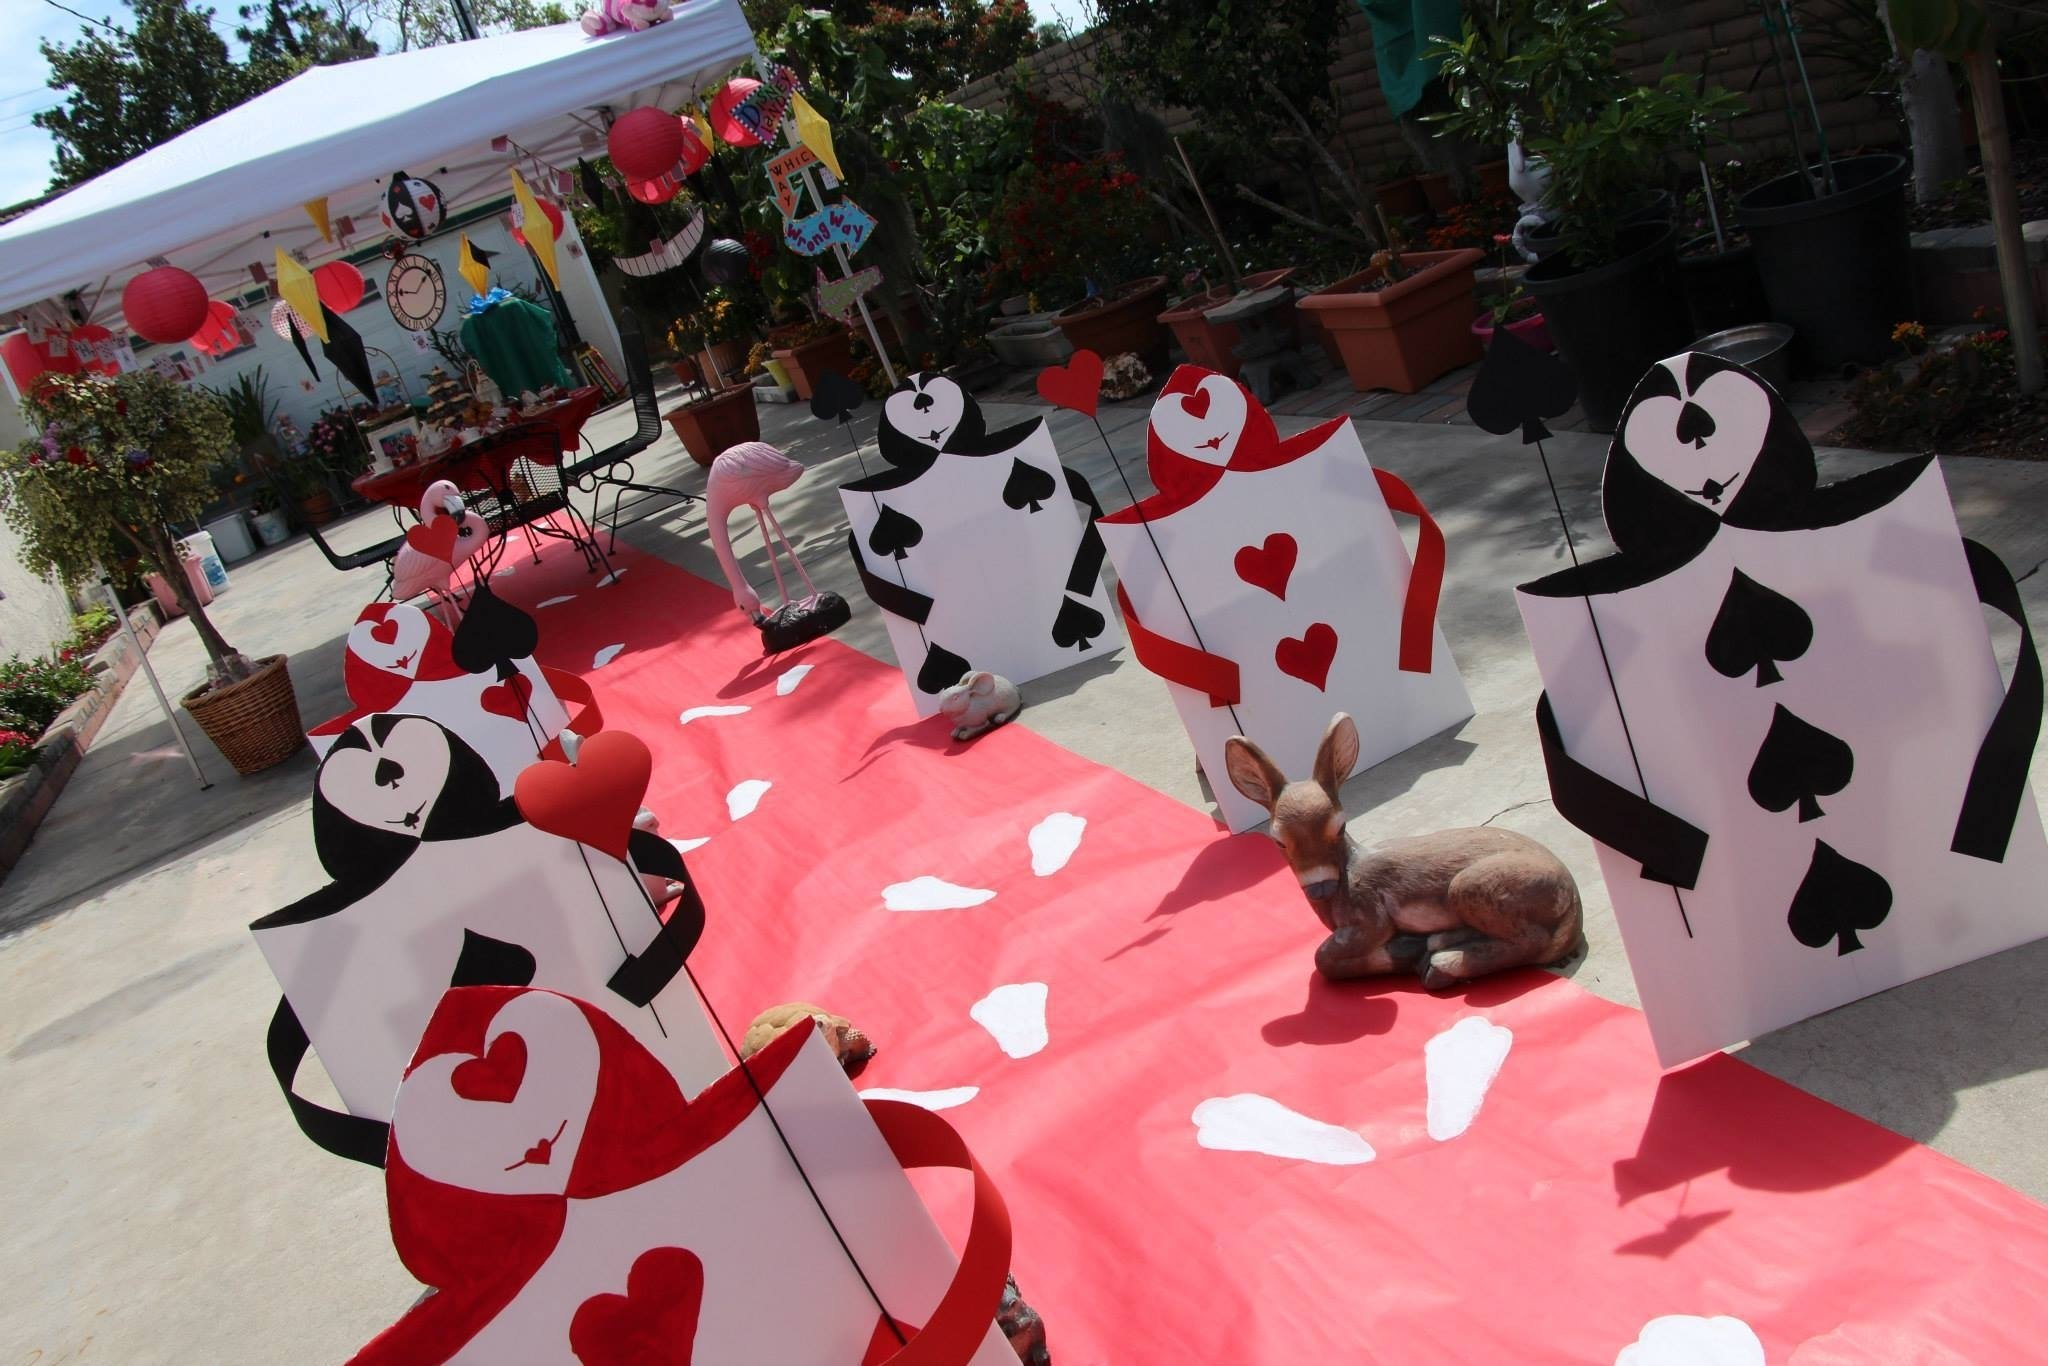 10 Famous Alice And Wonderland Party Ideas disney alice in wonderland diy tea party card soliders disneyexaminer 2020